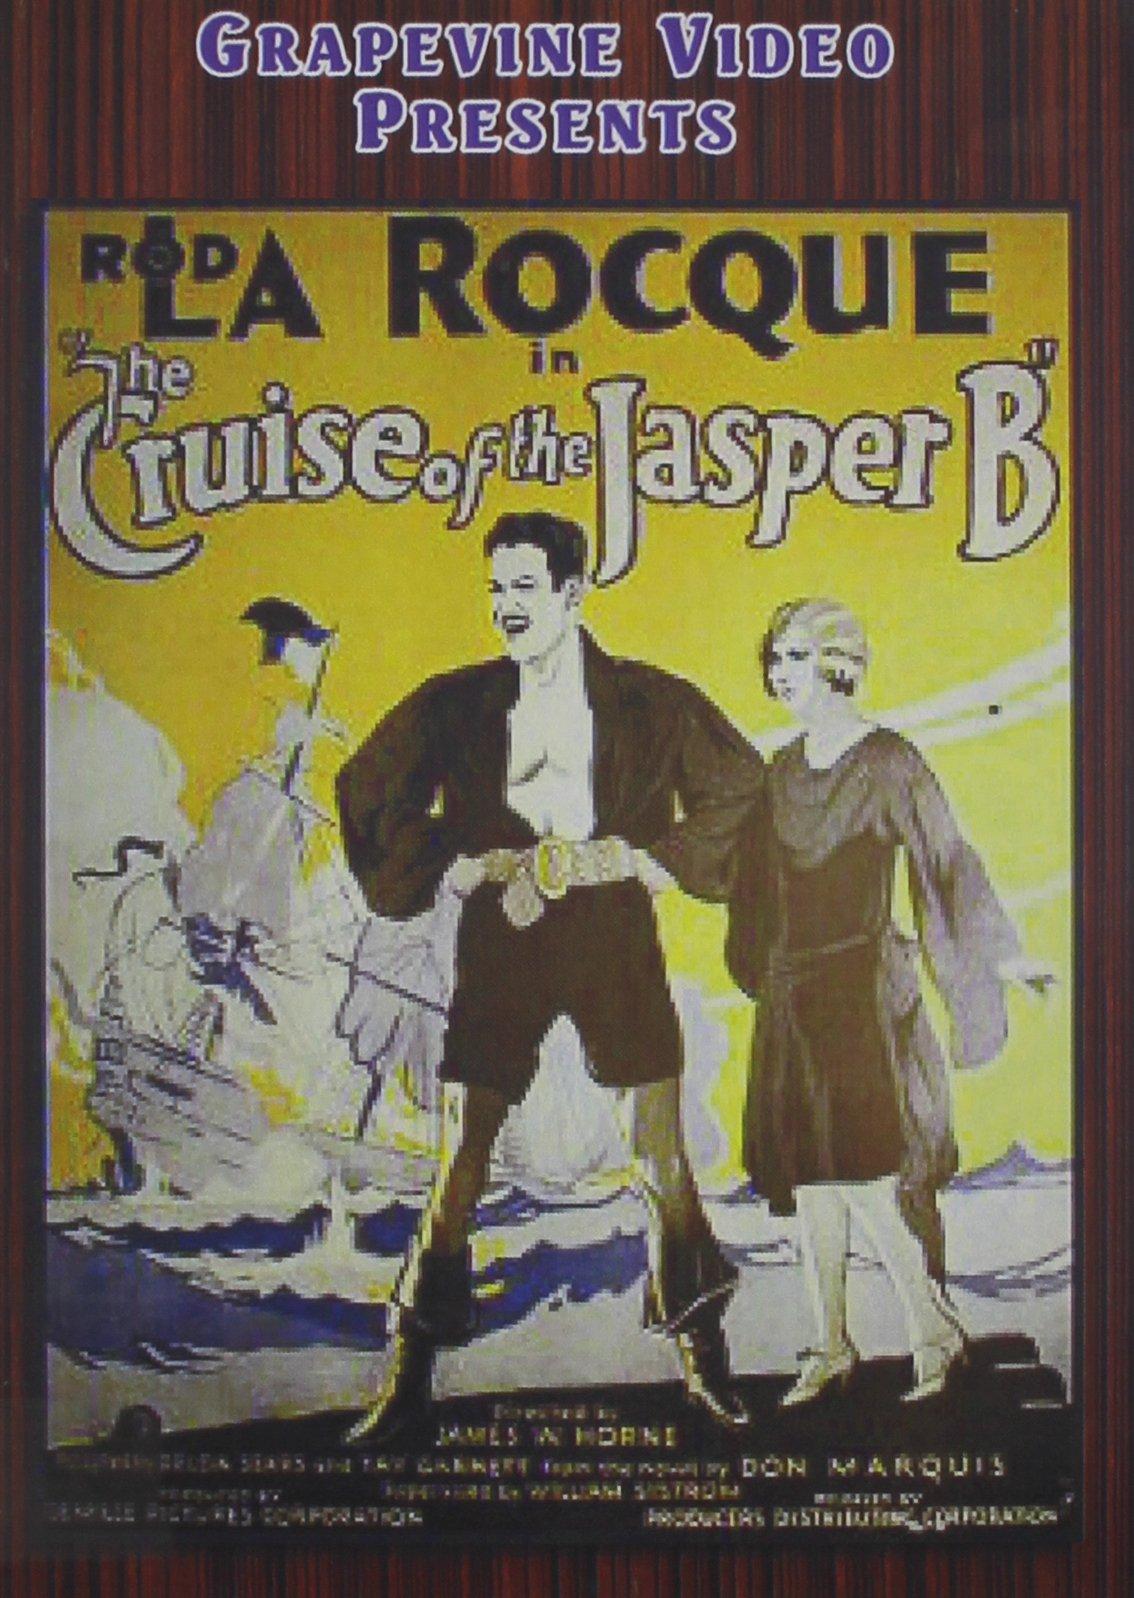 DVD : The Cruise Of The Jasper B (DVD)